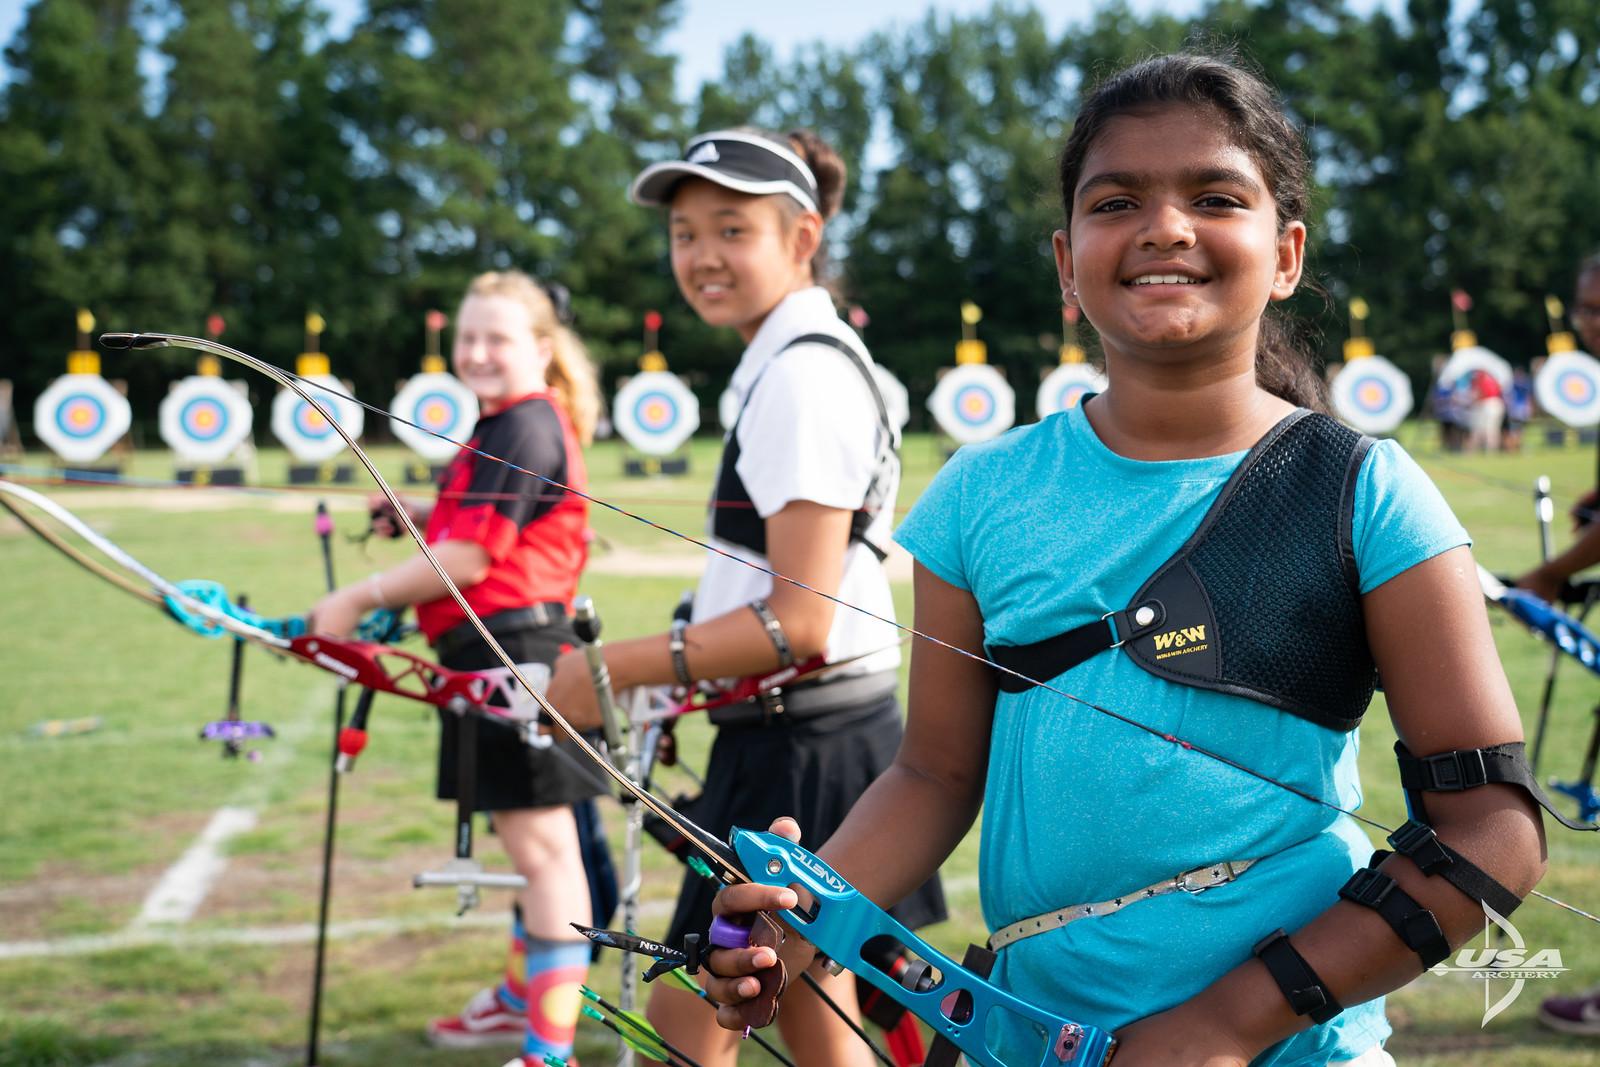 USA Archery Releases Athlete Development Model